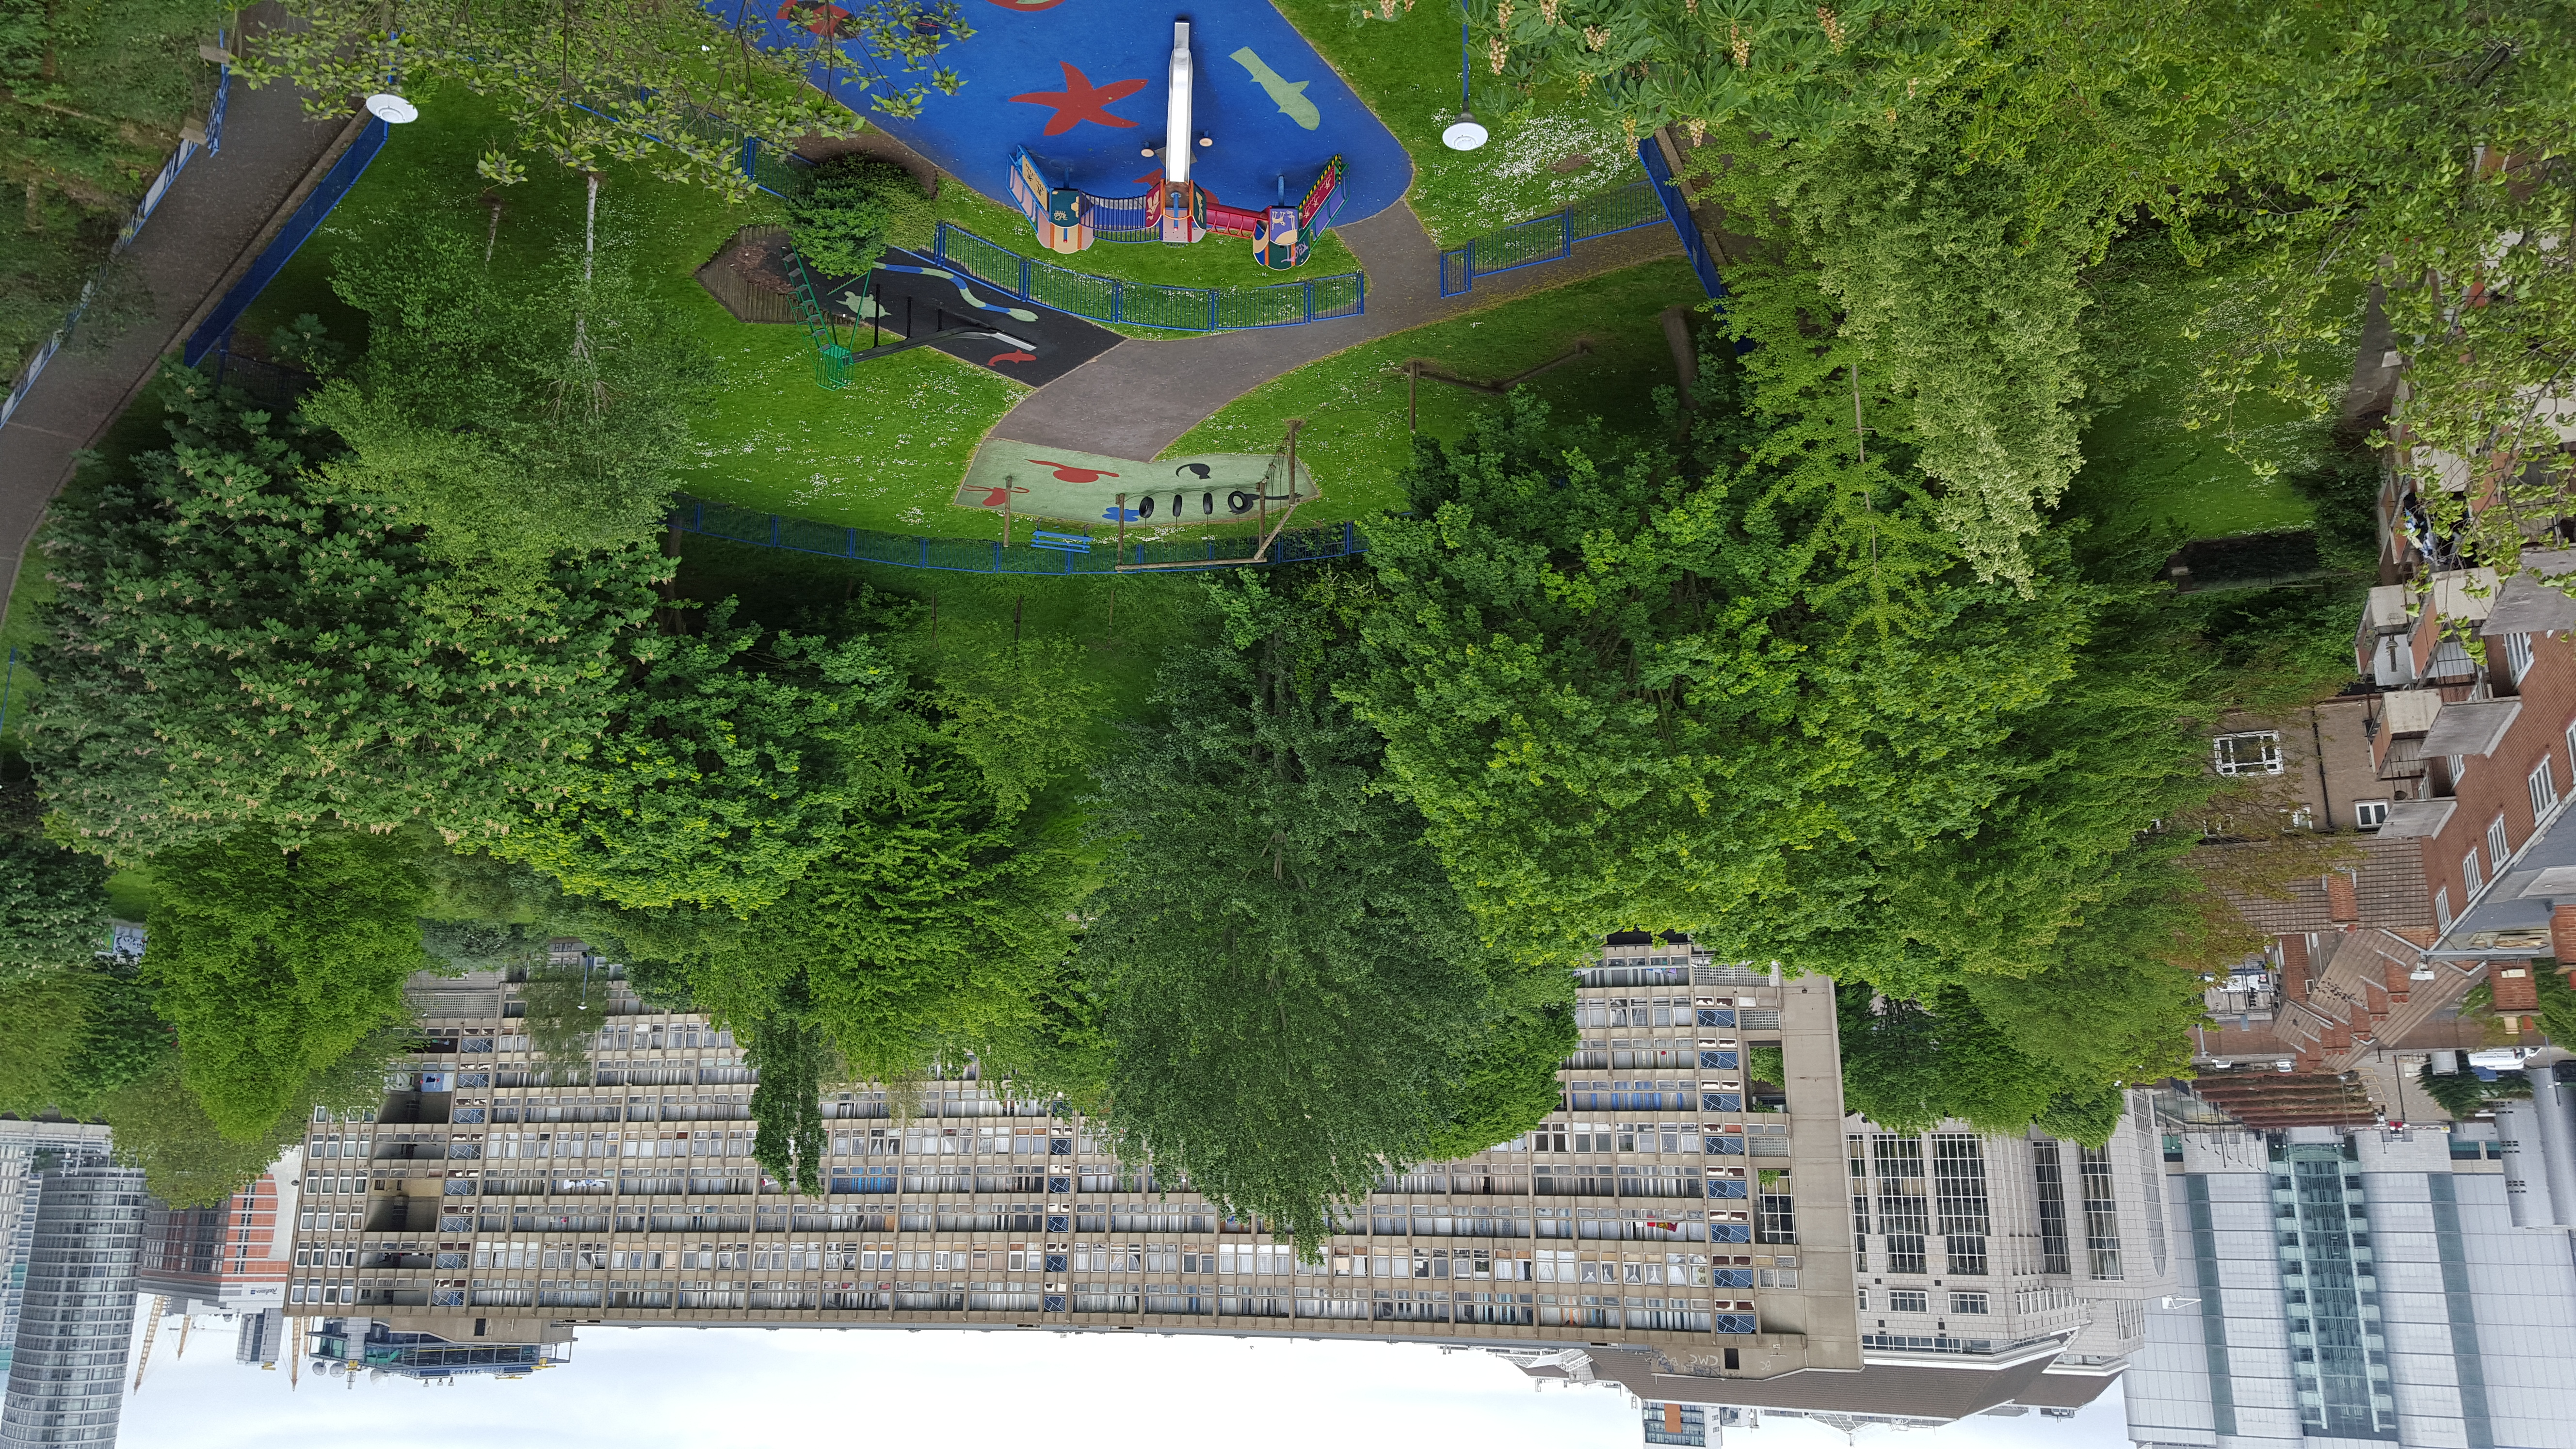 Robin Hood Gardens